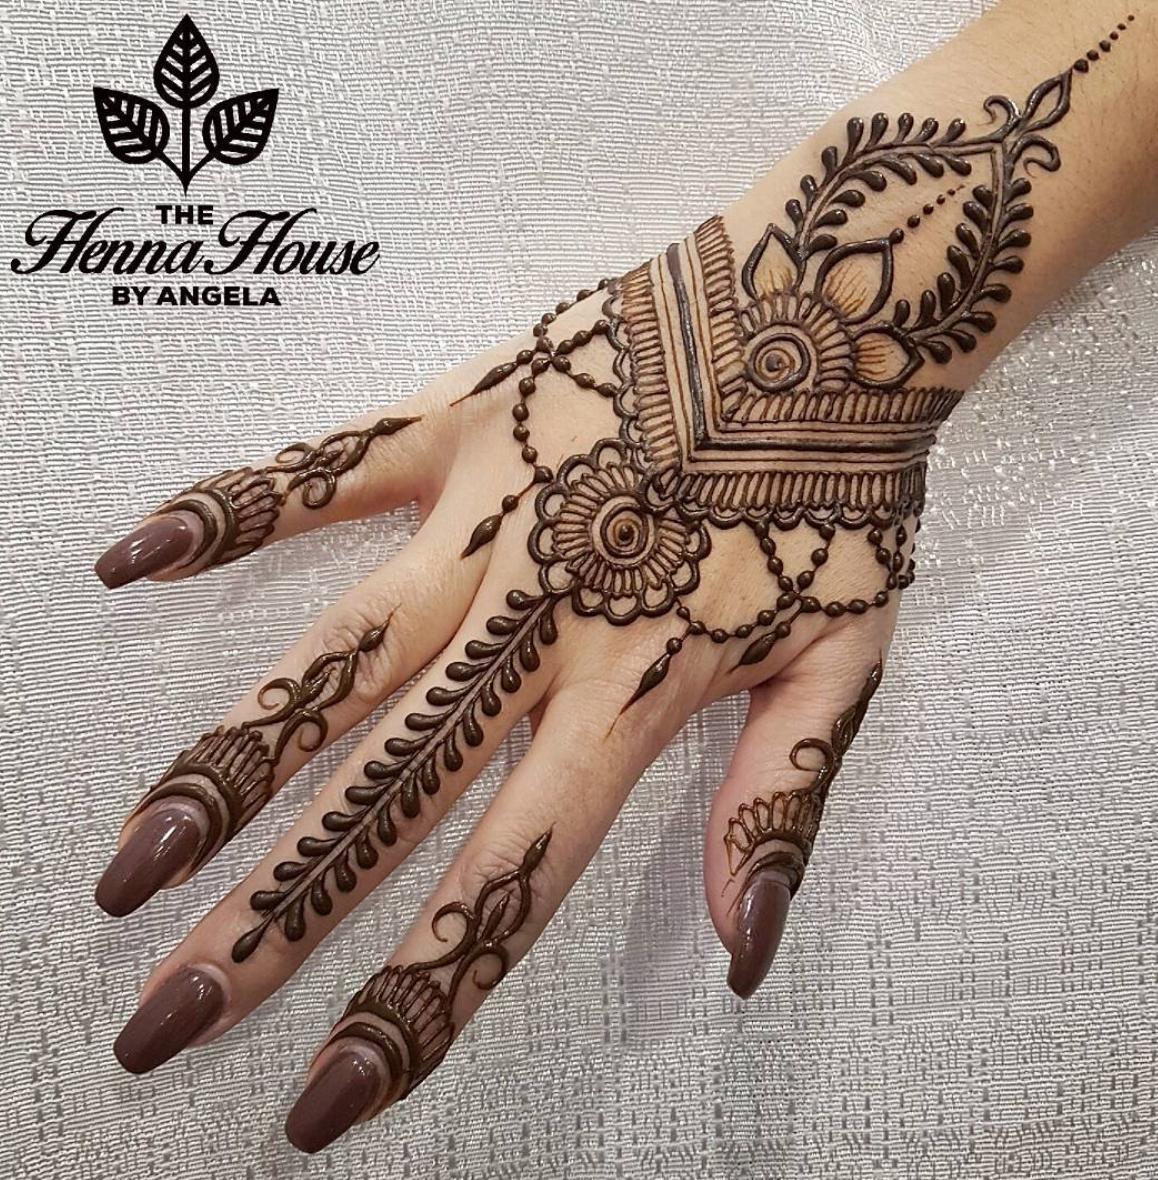 20 Us 28 Us Henna Pinterest Henna Tatuajes De Henna And